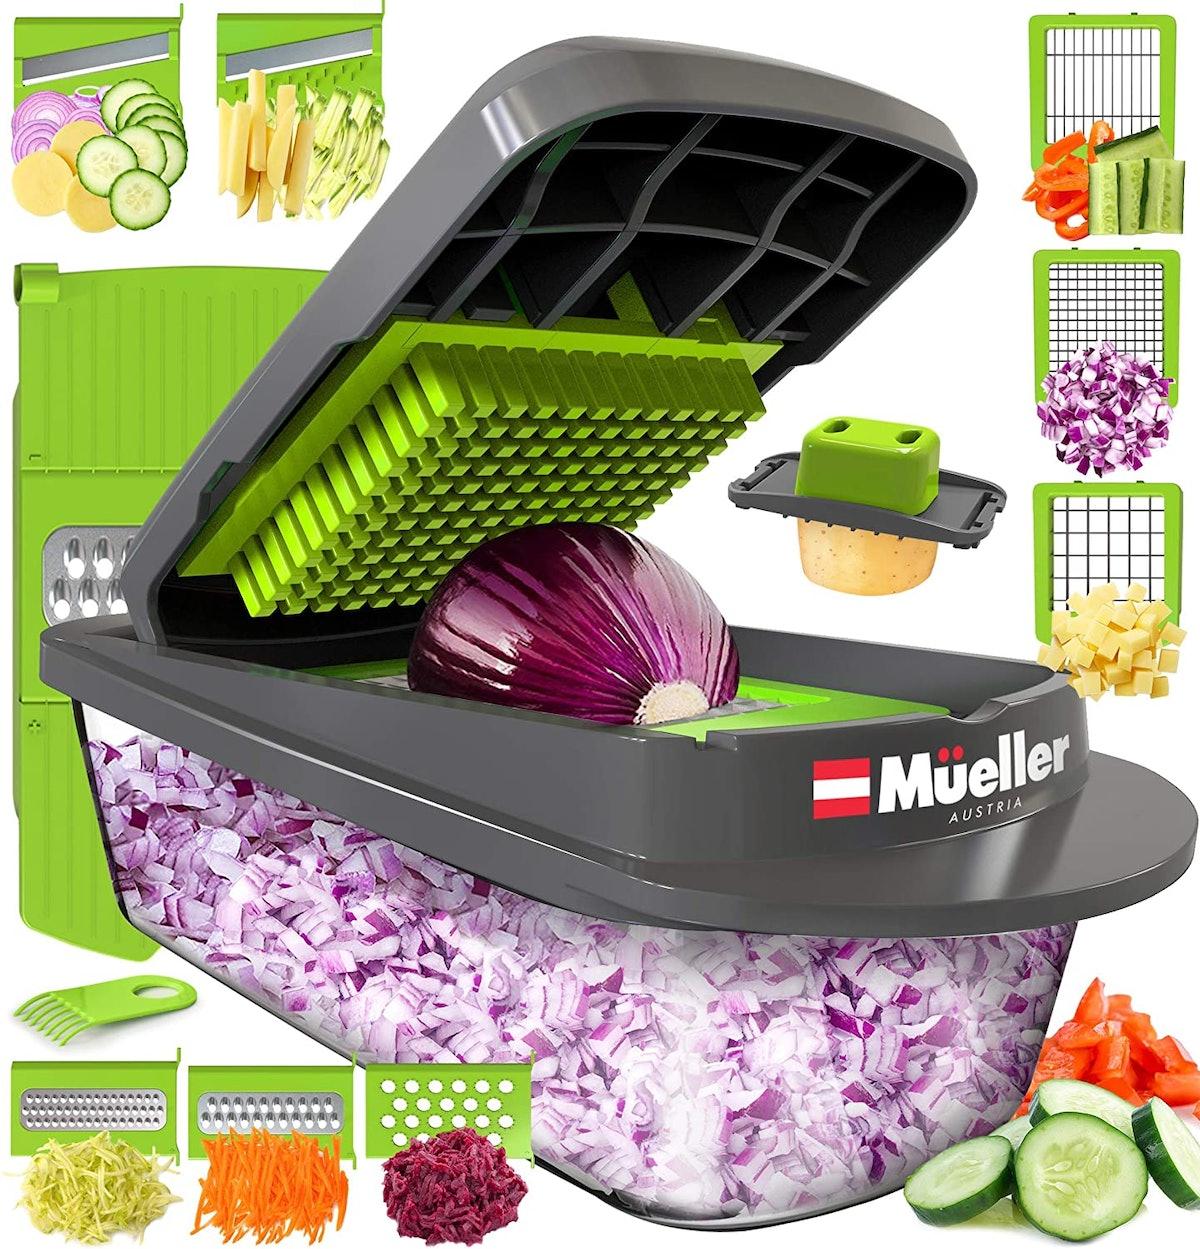 Mueller Austria Pro-Series Vegetable Chopper